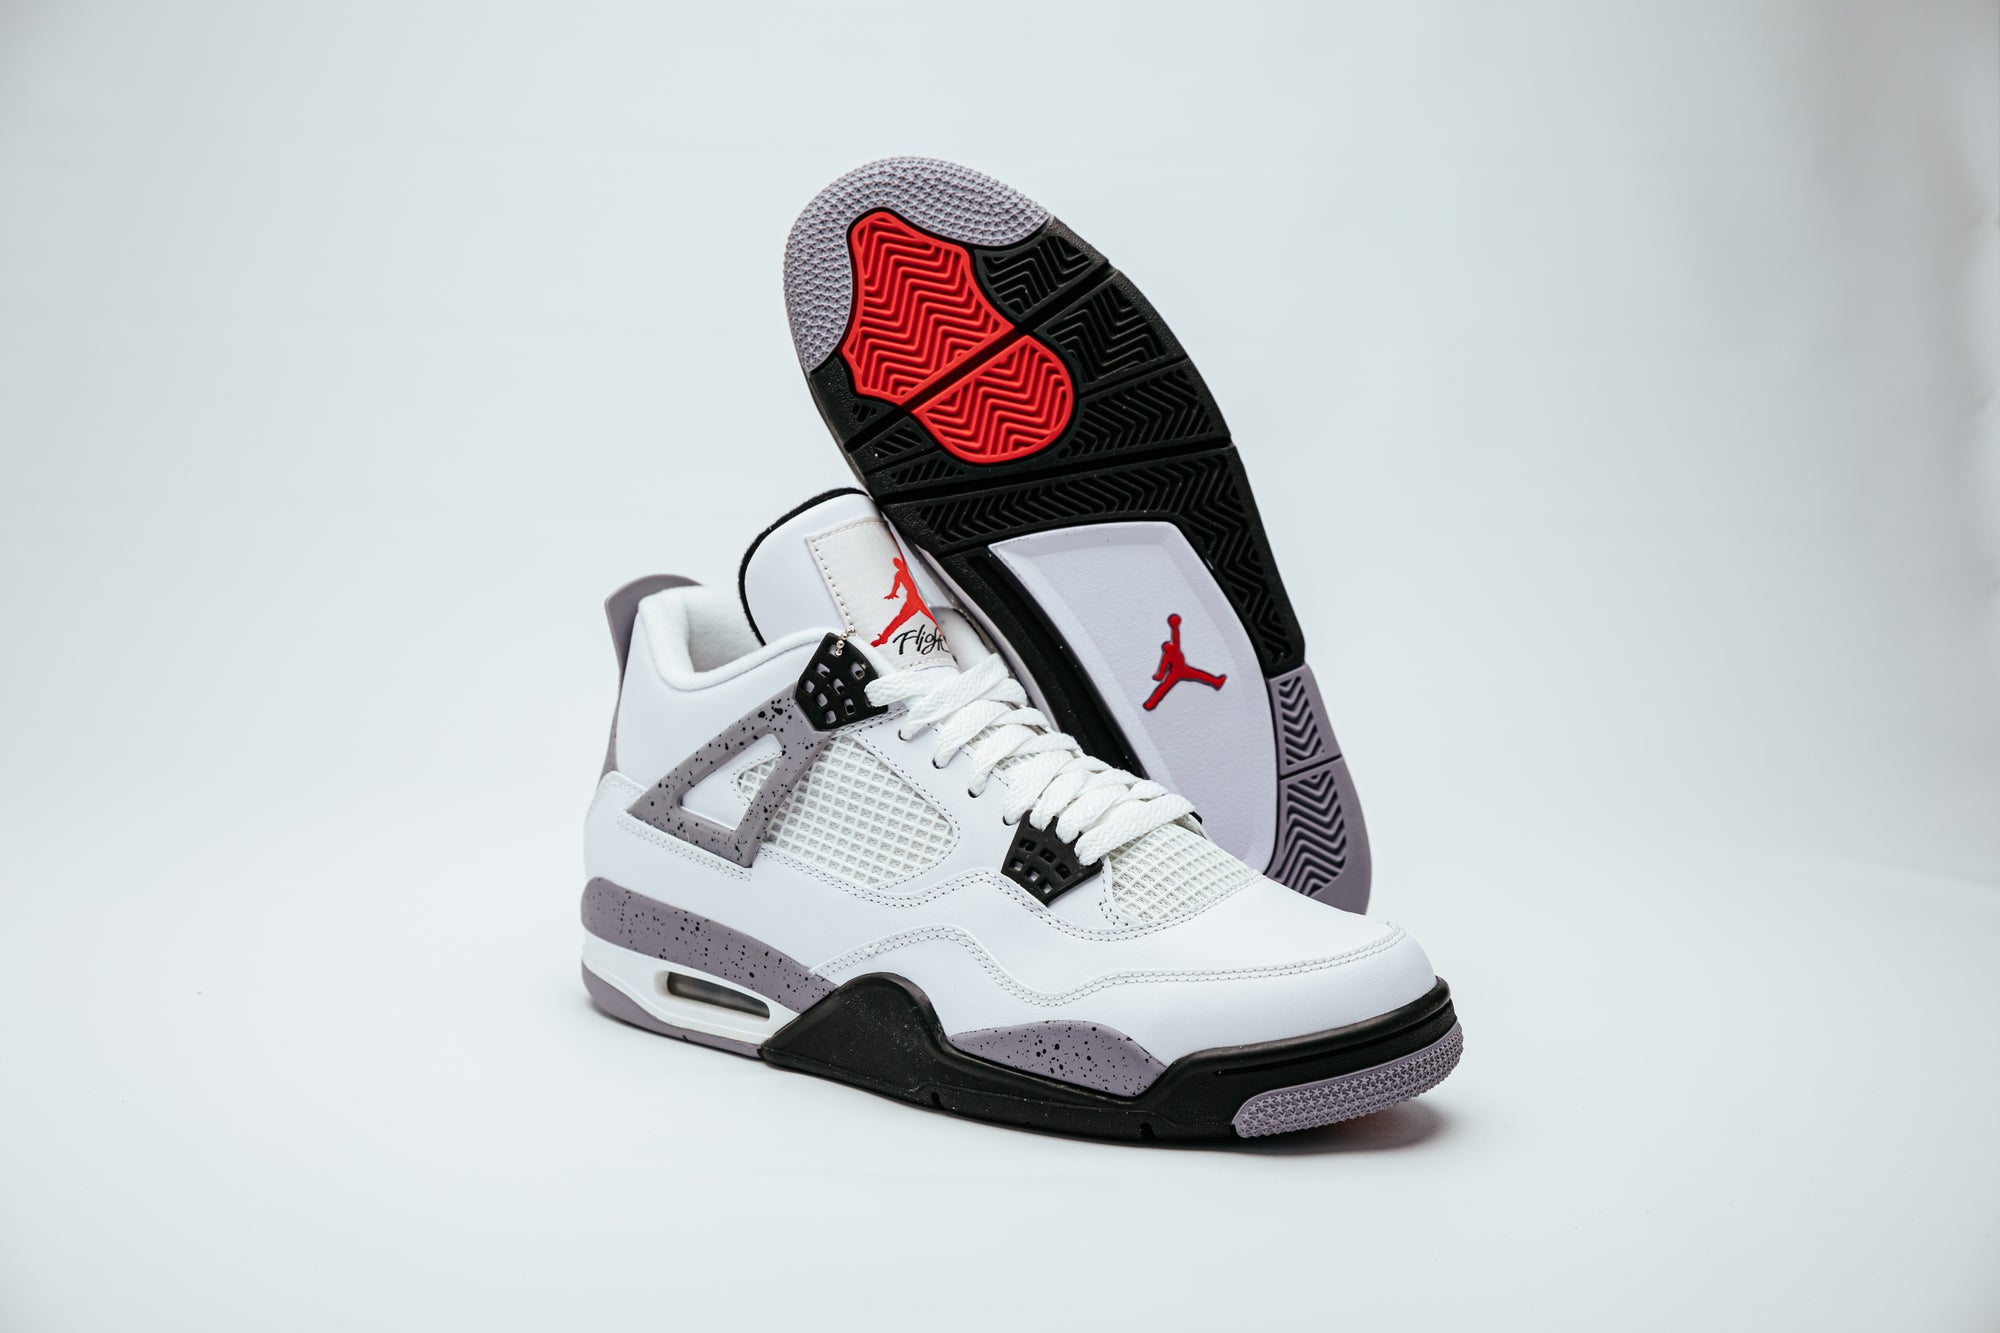 Enumerar torpe Depresión  Air Jordan 4 Retro - Cement | ALLSOLEDOUT